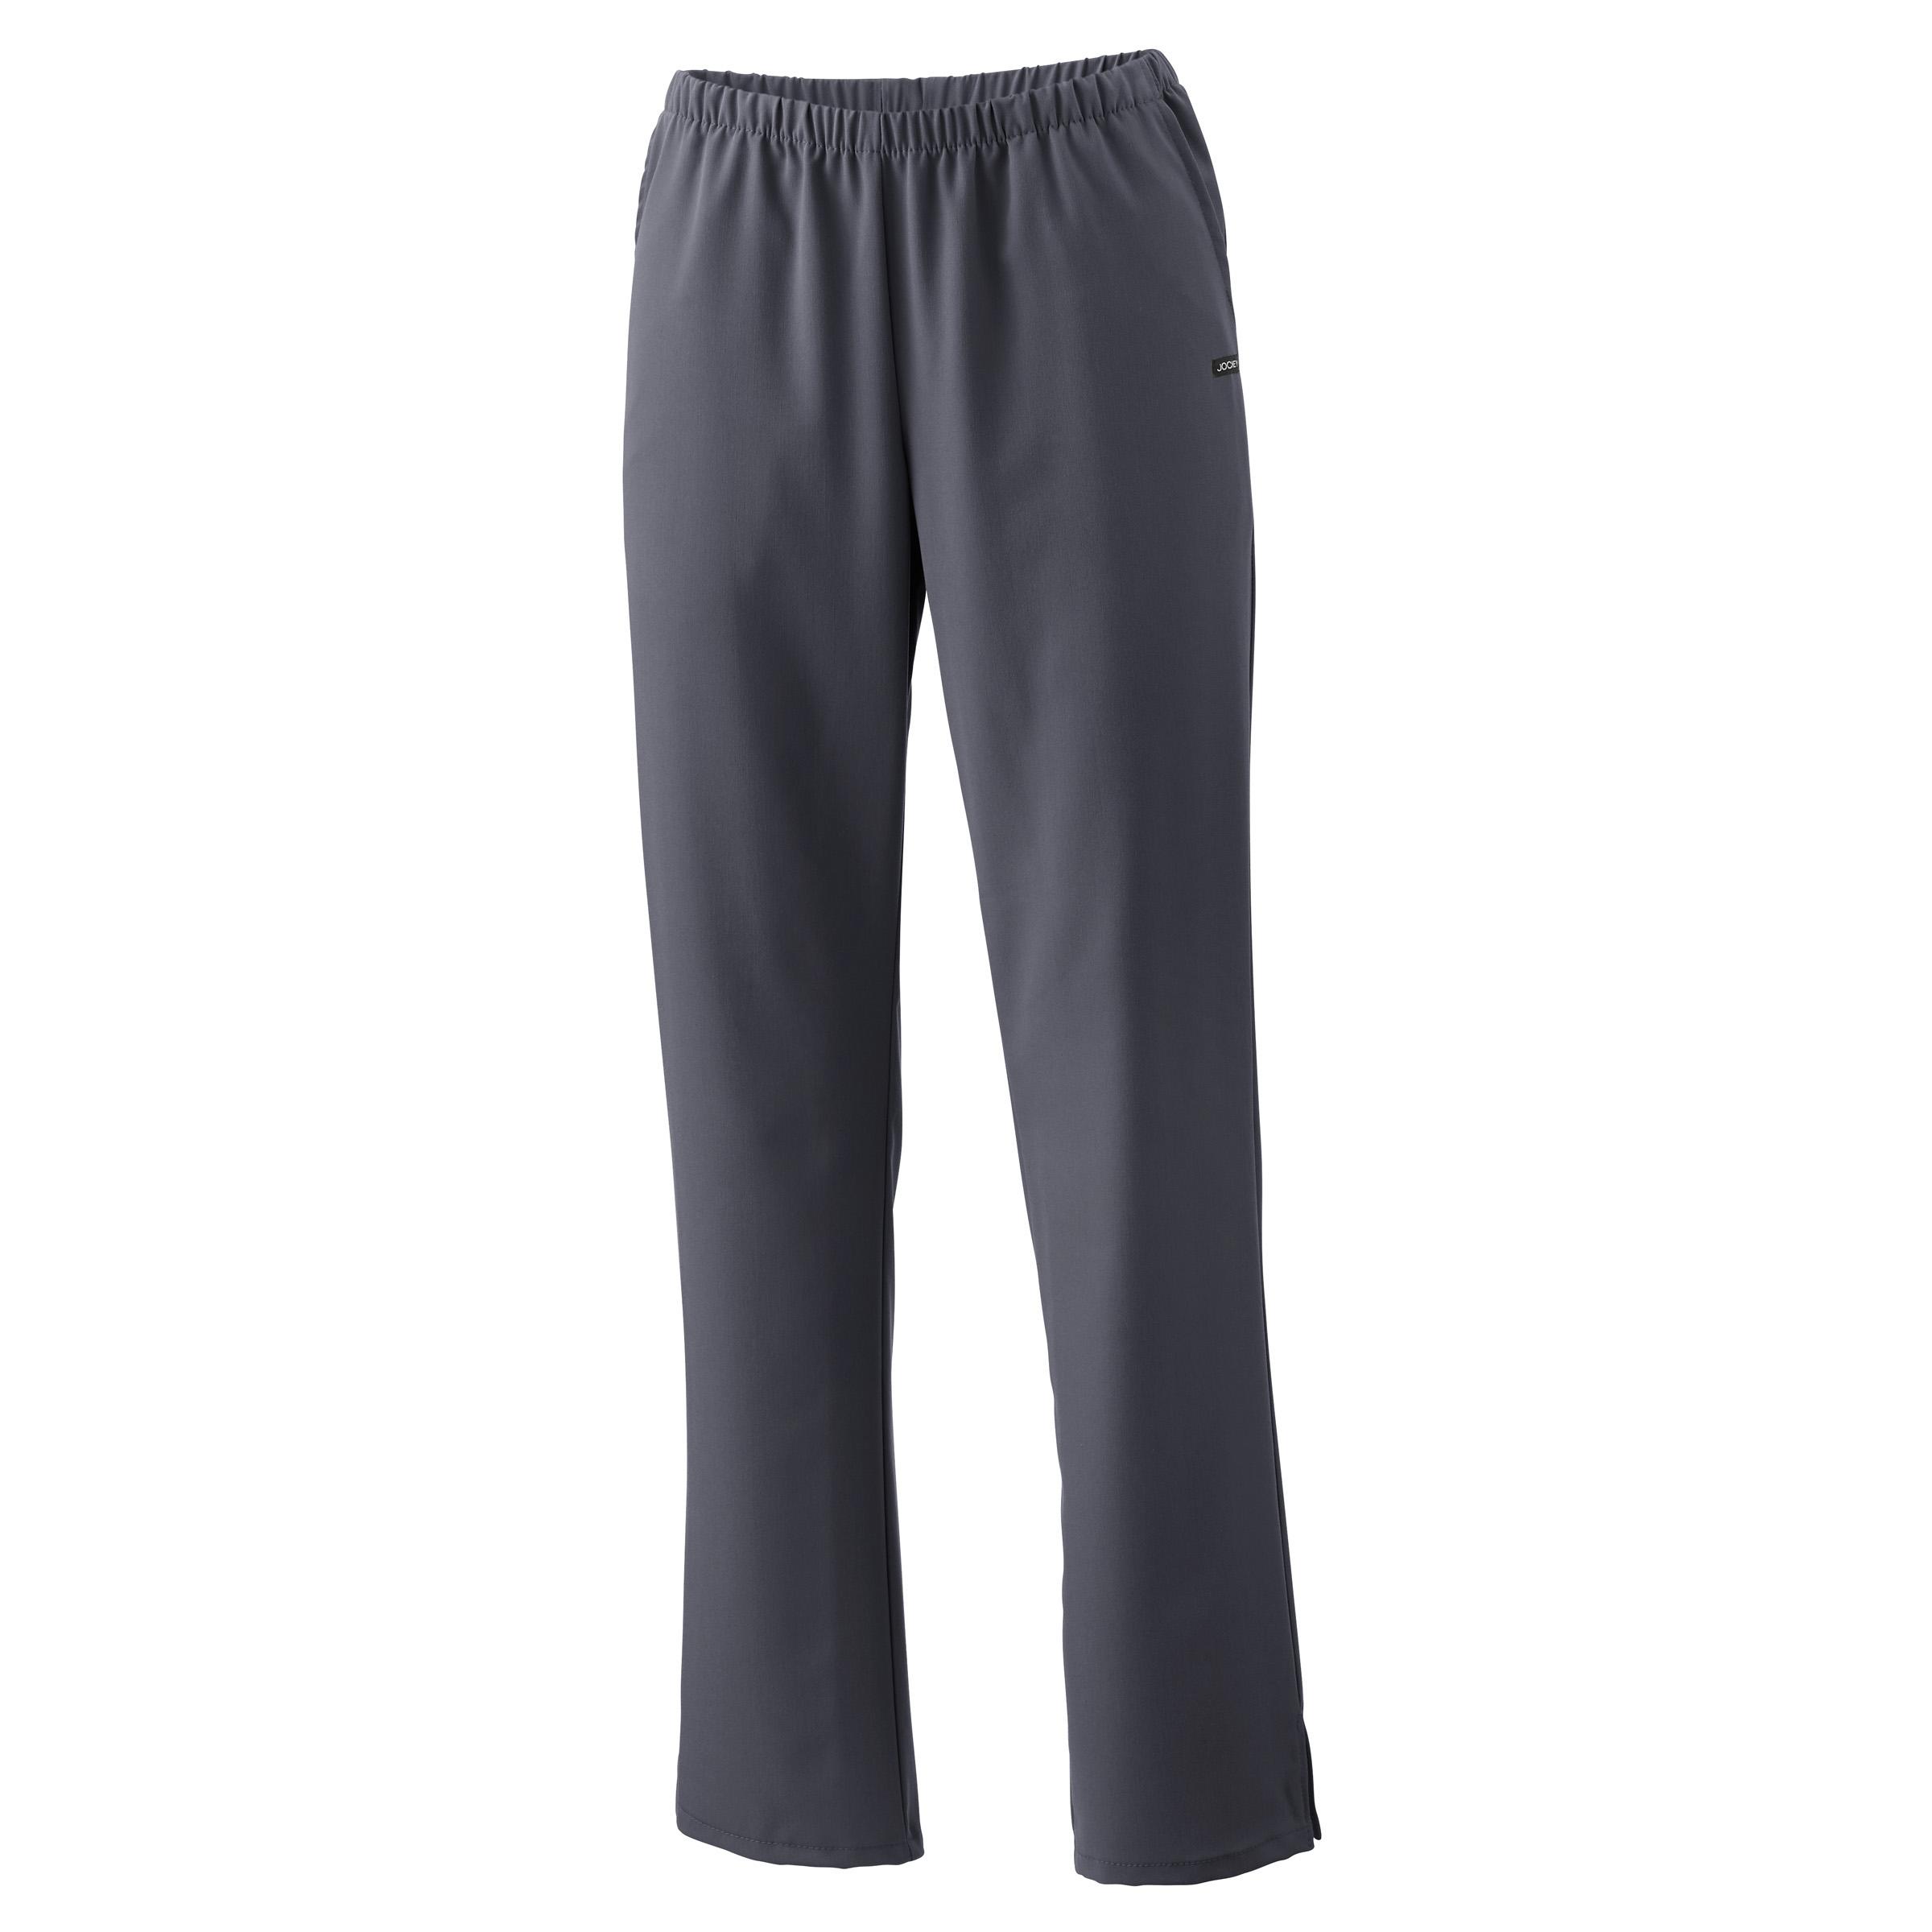 946c181a4e0 Buy Jockey Ladies Pull On Full Elastic Waist Pant - Jockey Scrubs ...